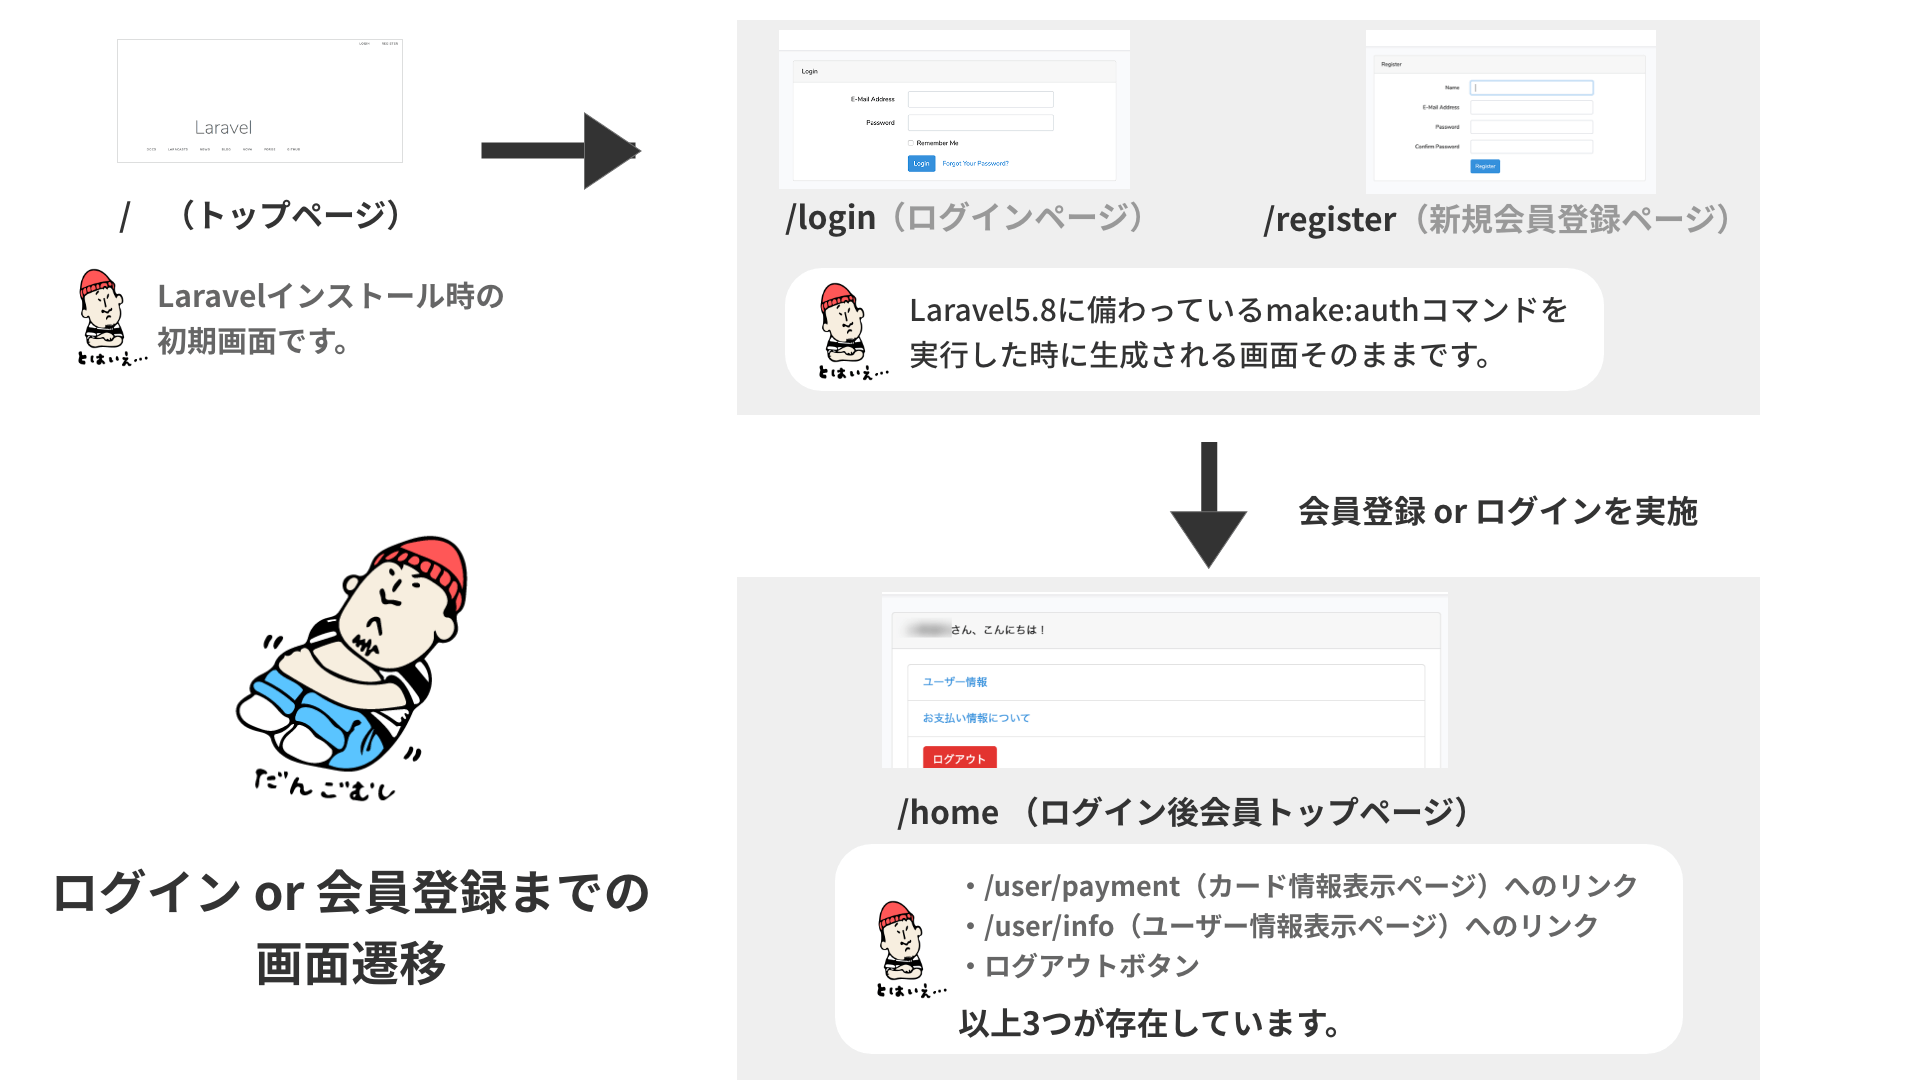 LaravelとStripeで作成するものの画面遷移図